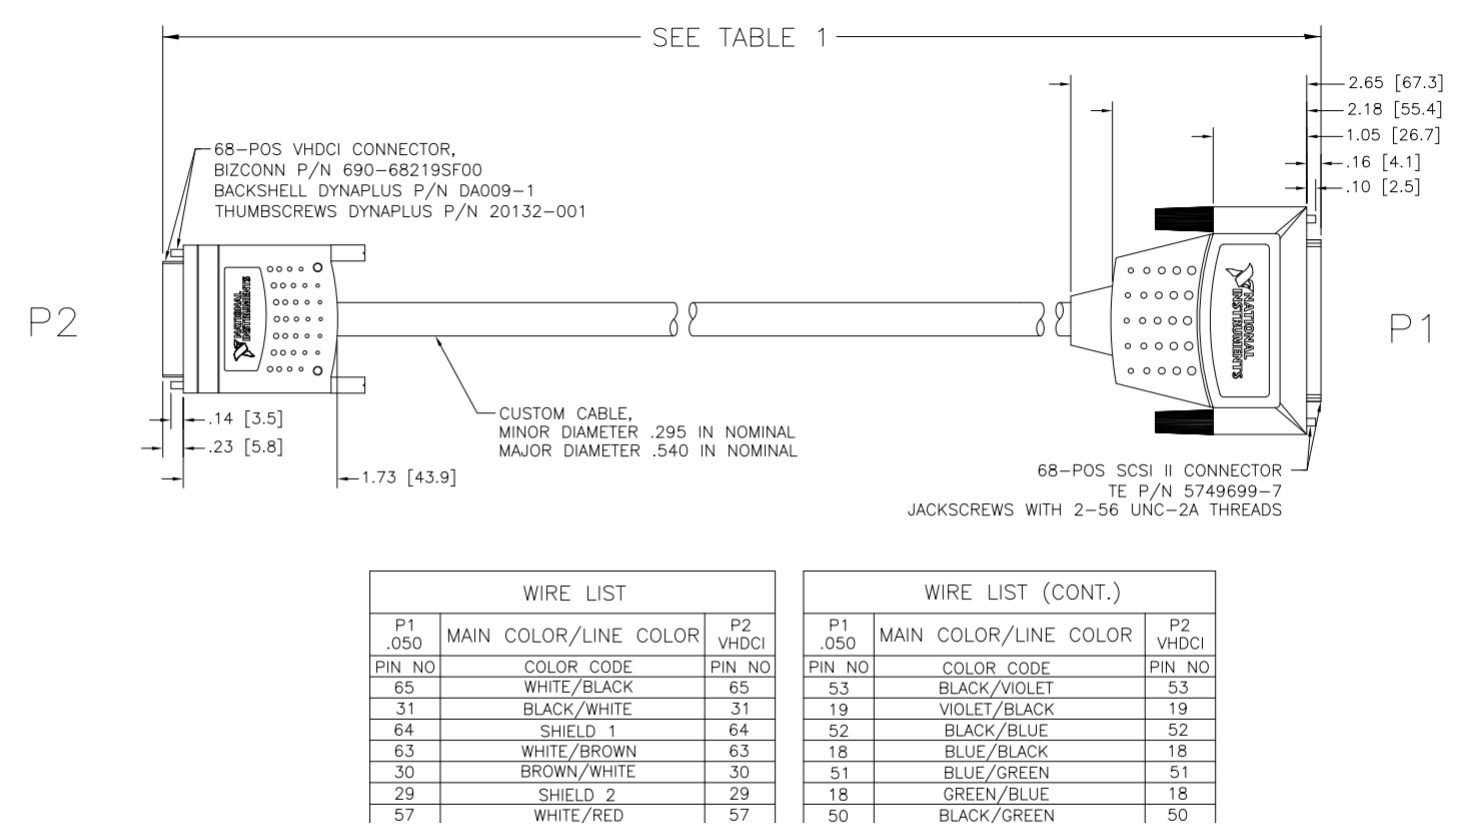 Scsi To Rj45 Wiring Diagram Online Manuual Of 568b Pdf Todays Rh 7 15 8 1813weddingbarn Com Cat 5